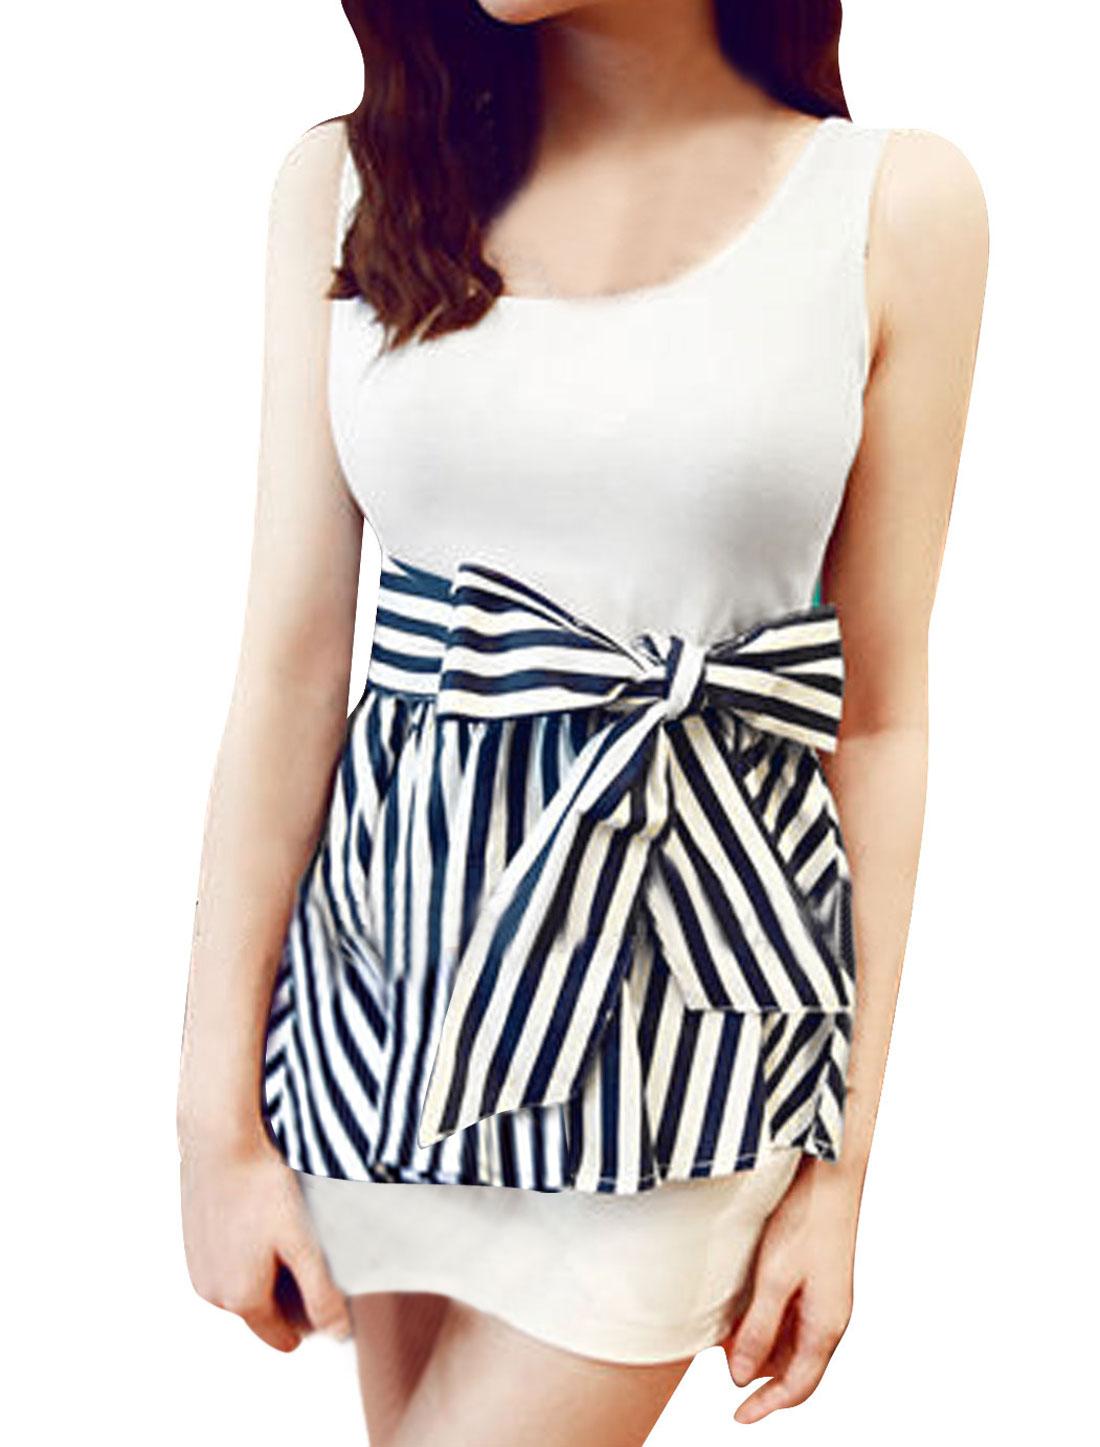 Lady Elastic Waist Stripes Top w Waist Strap White Dark Blue XS